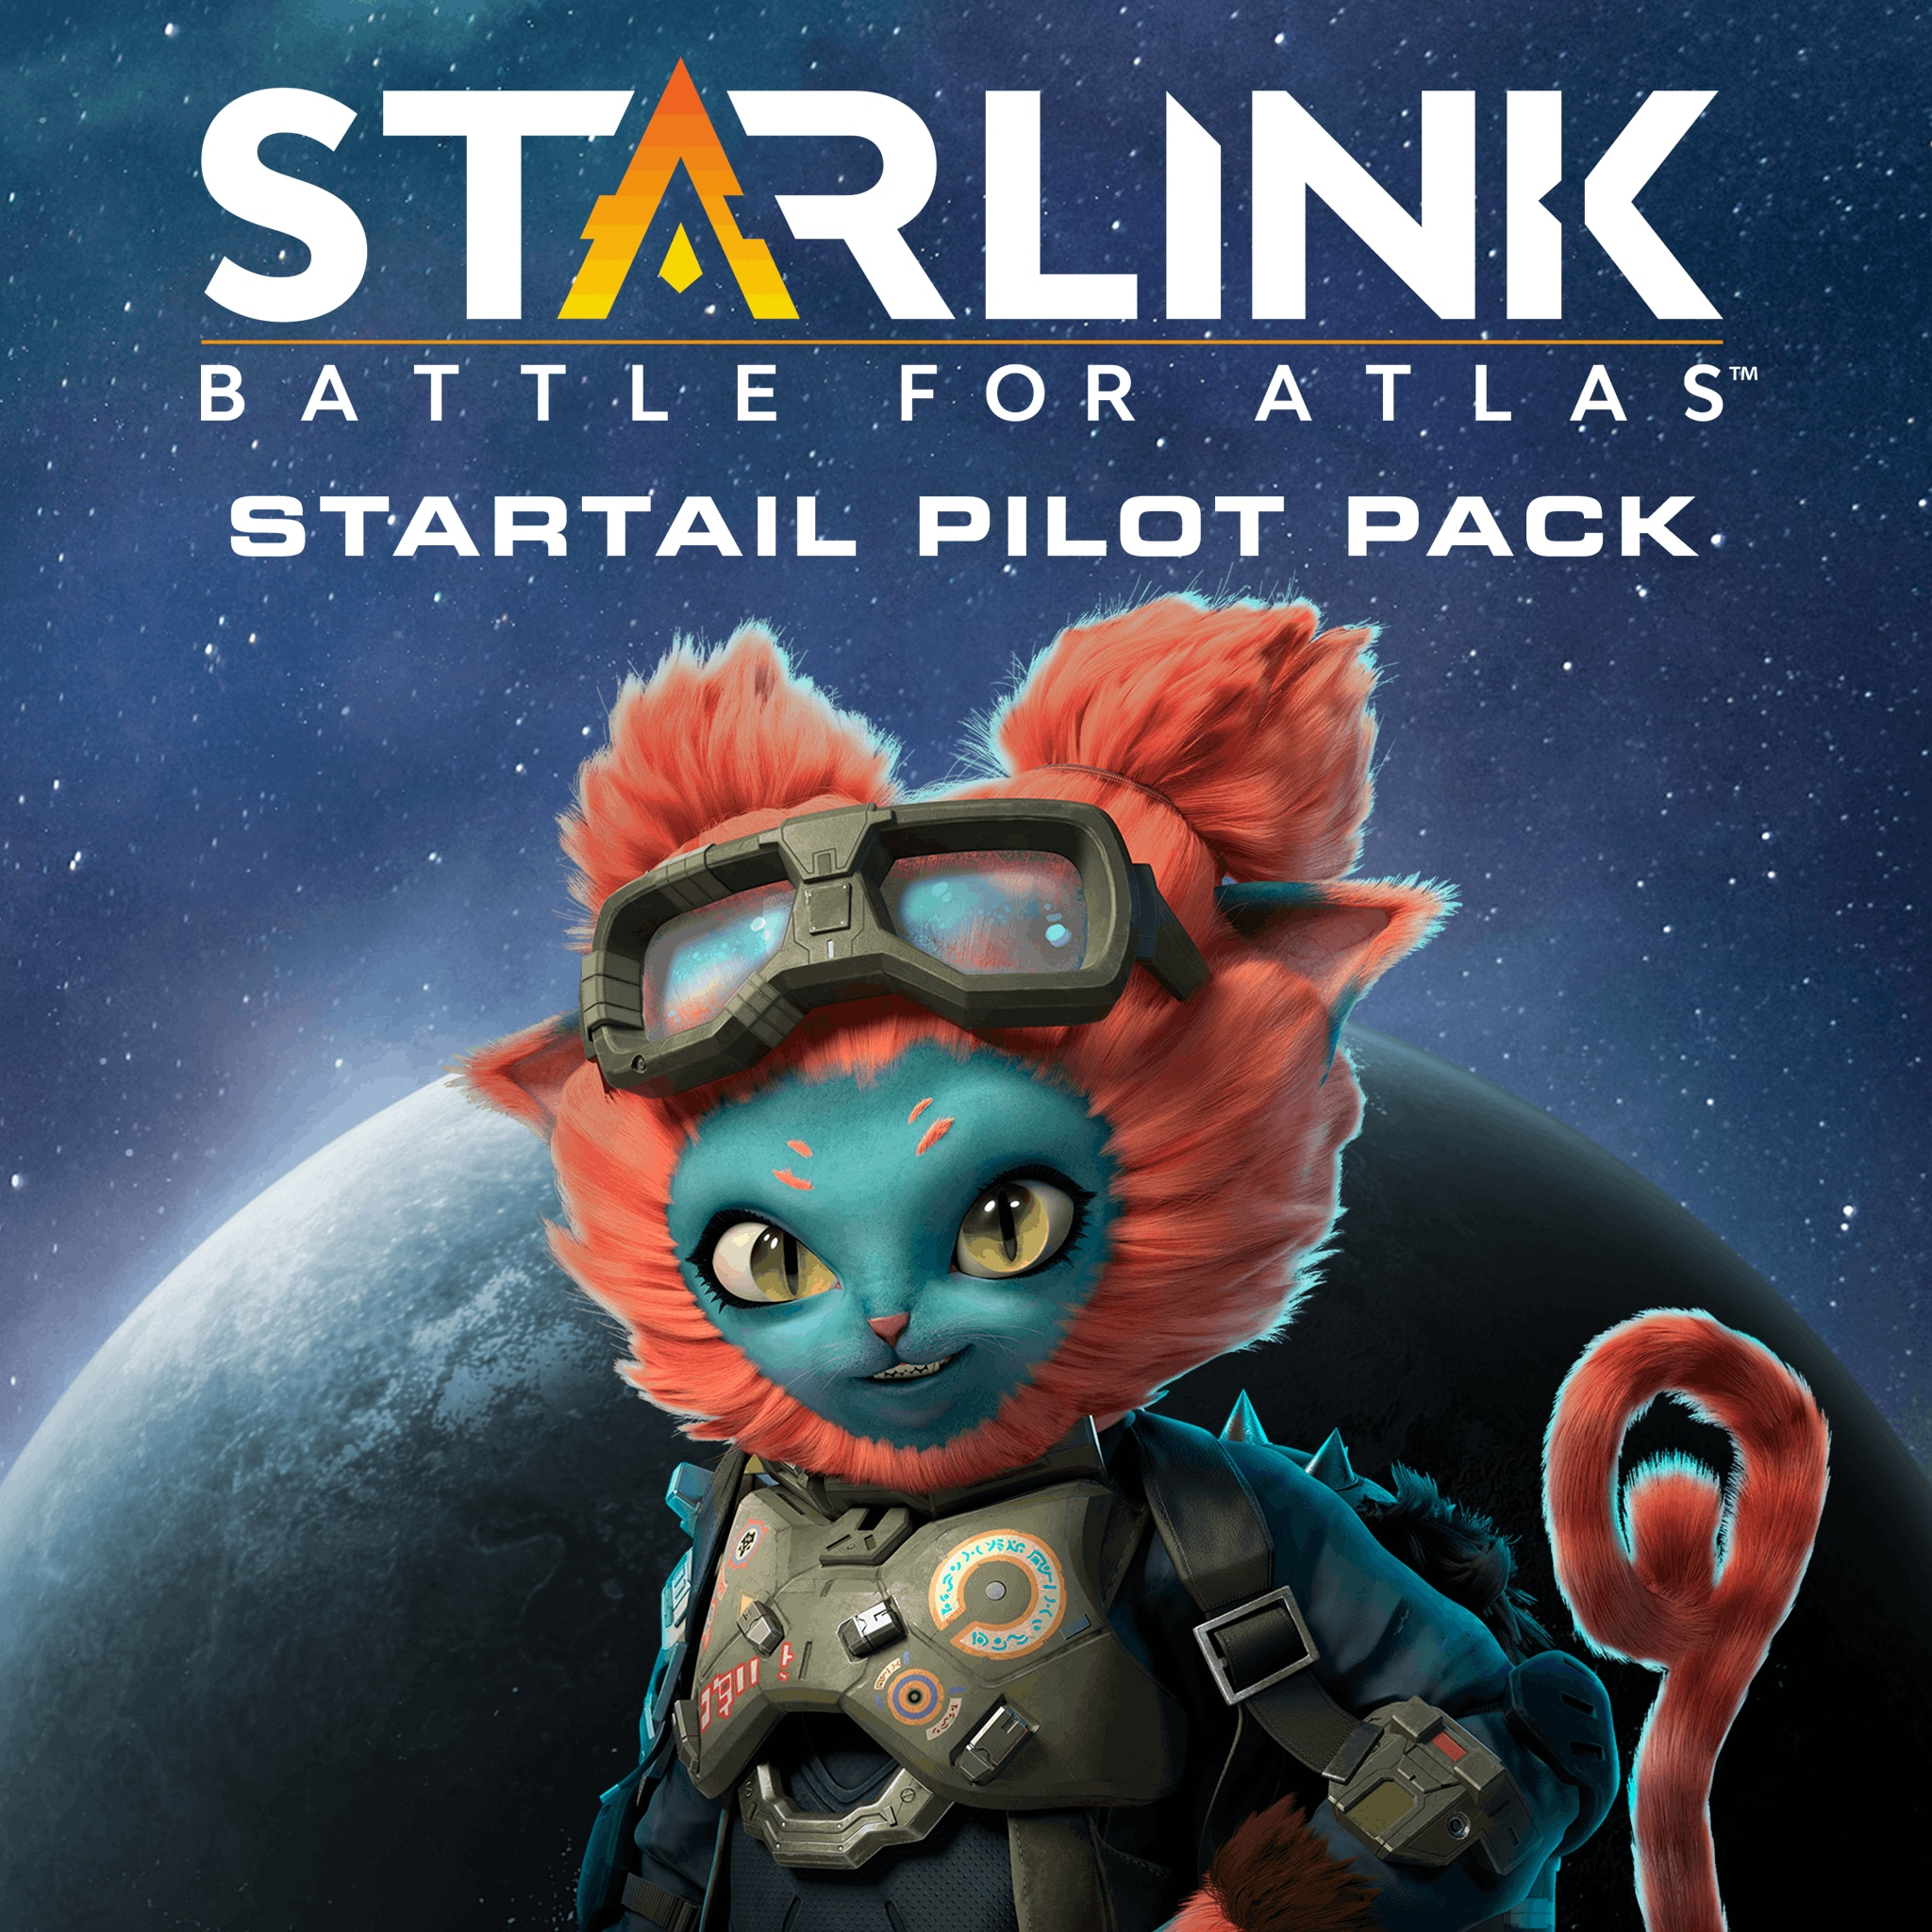 Starlink: Battle for Atlas Digital Startail Pilot Pack